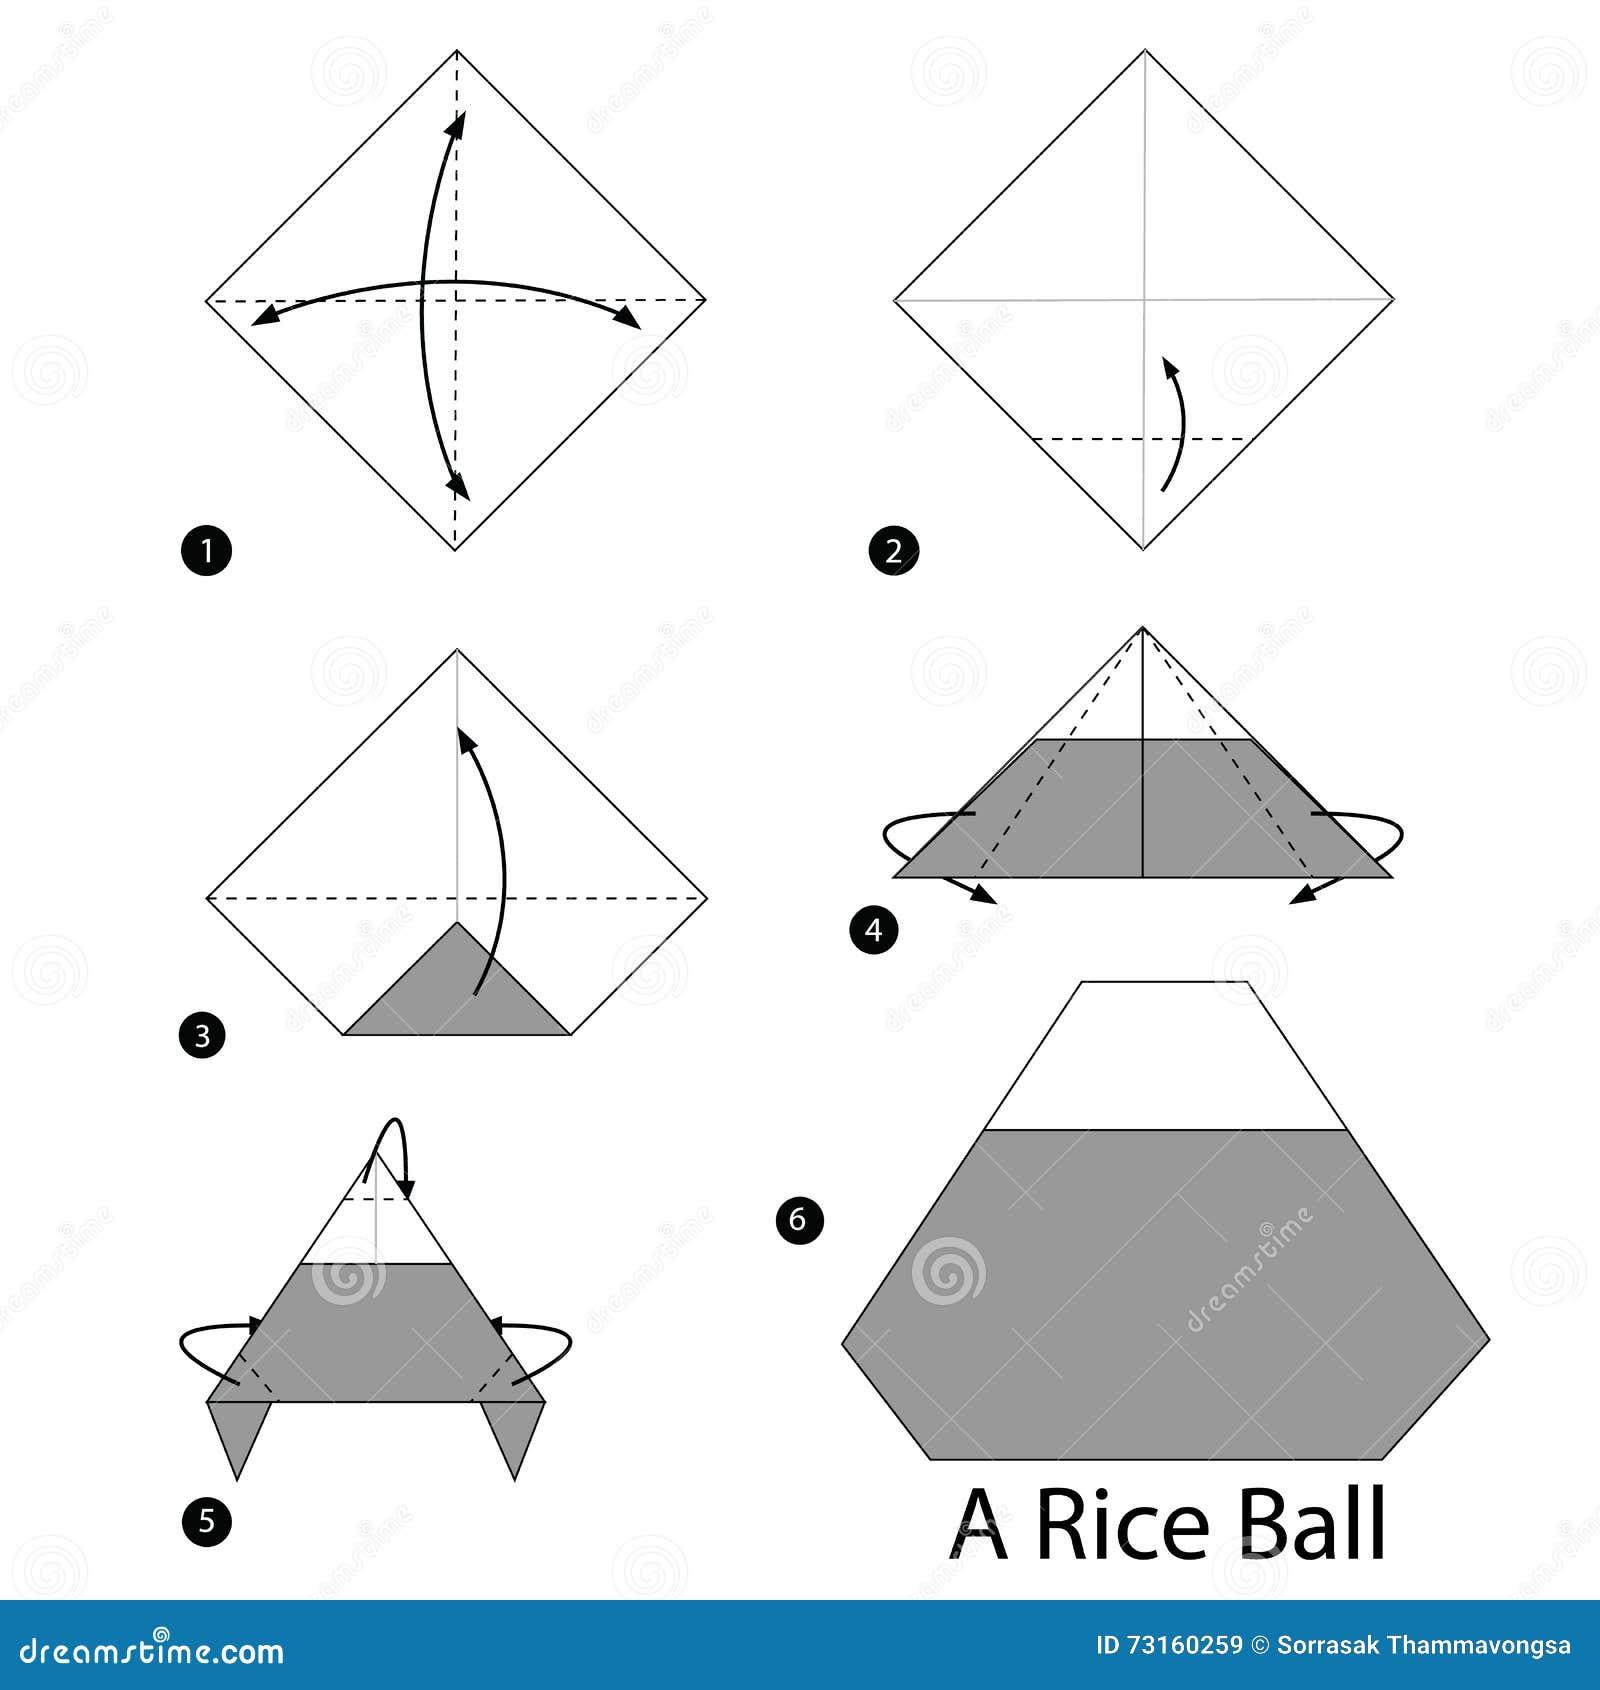 How to make an Origami Spike Ball - YouTube | 1390x1300